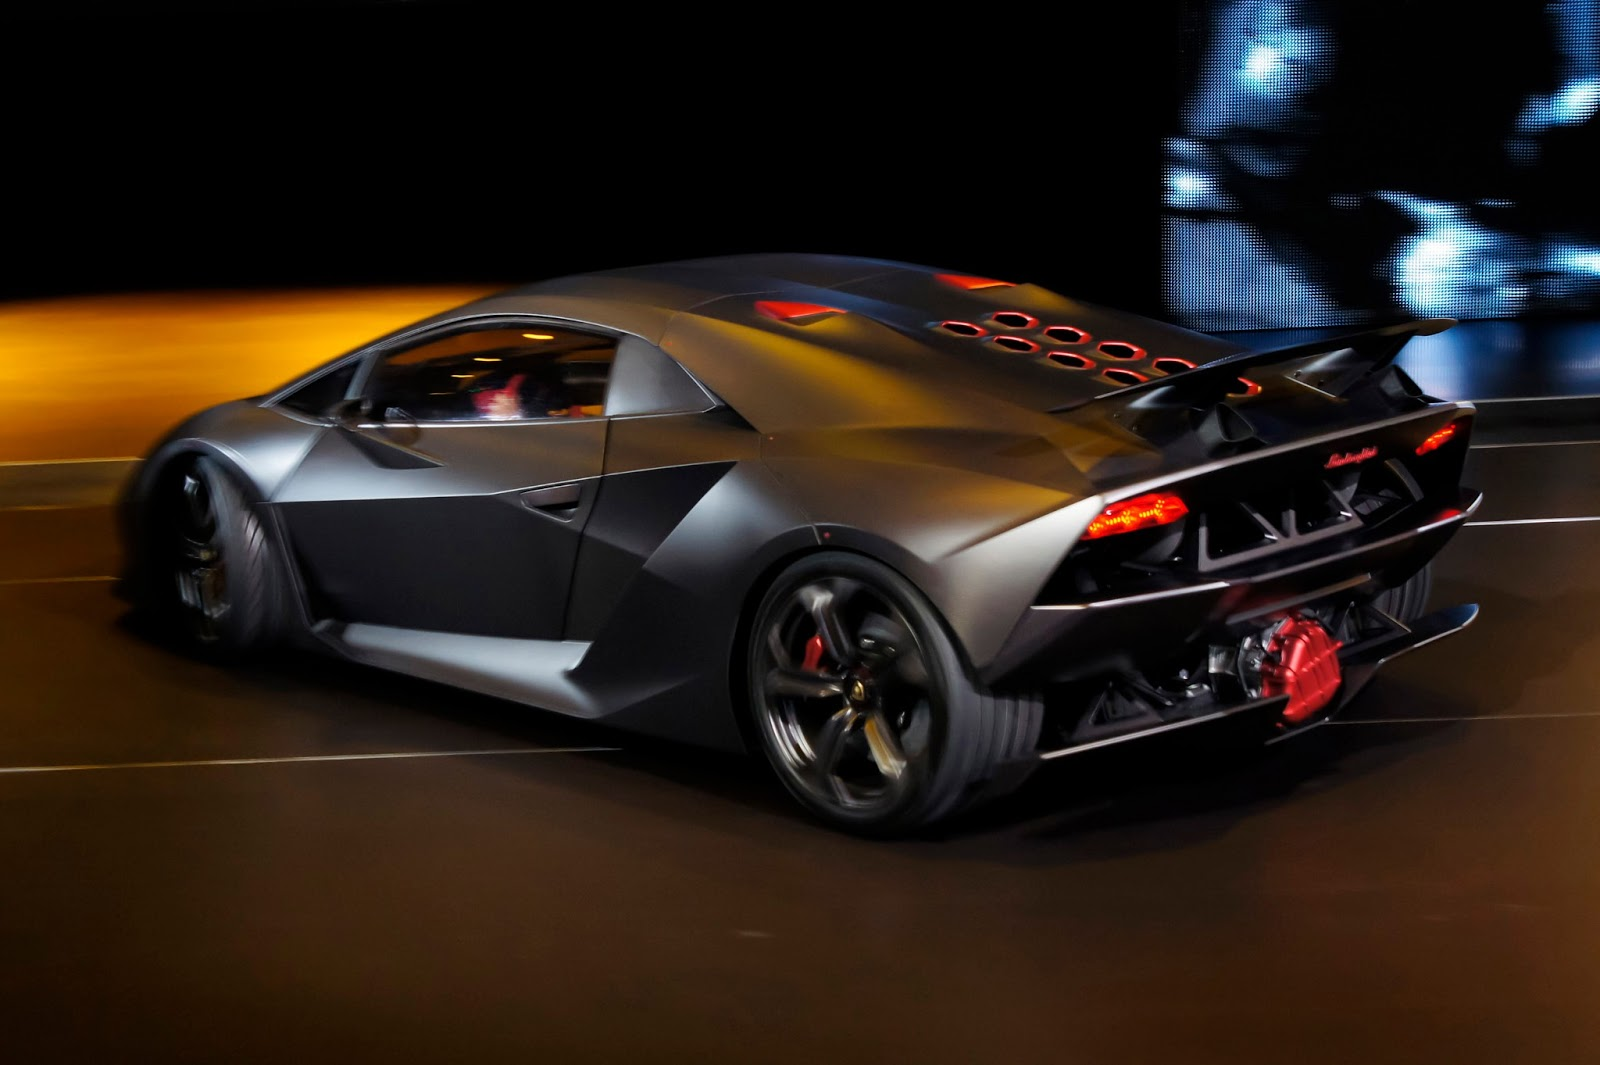 Luxury Lamborghini Cars: Lamborghini Sesto Elemento Spyder